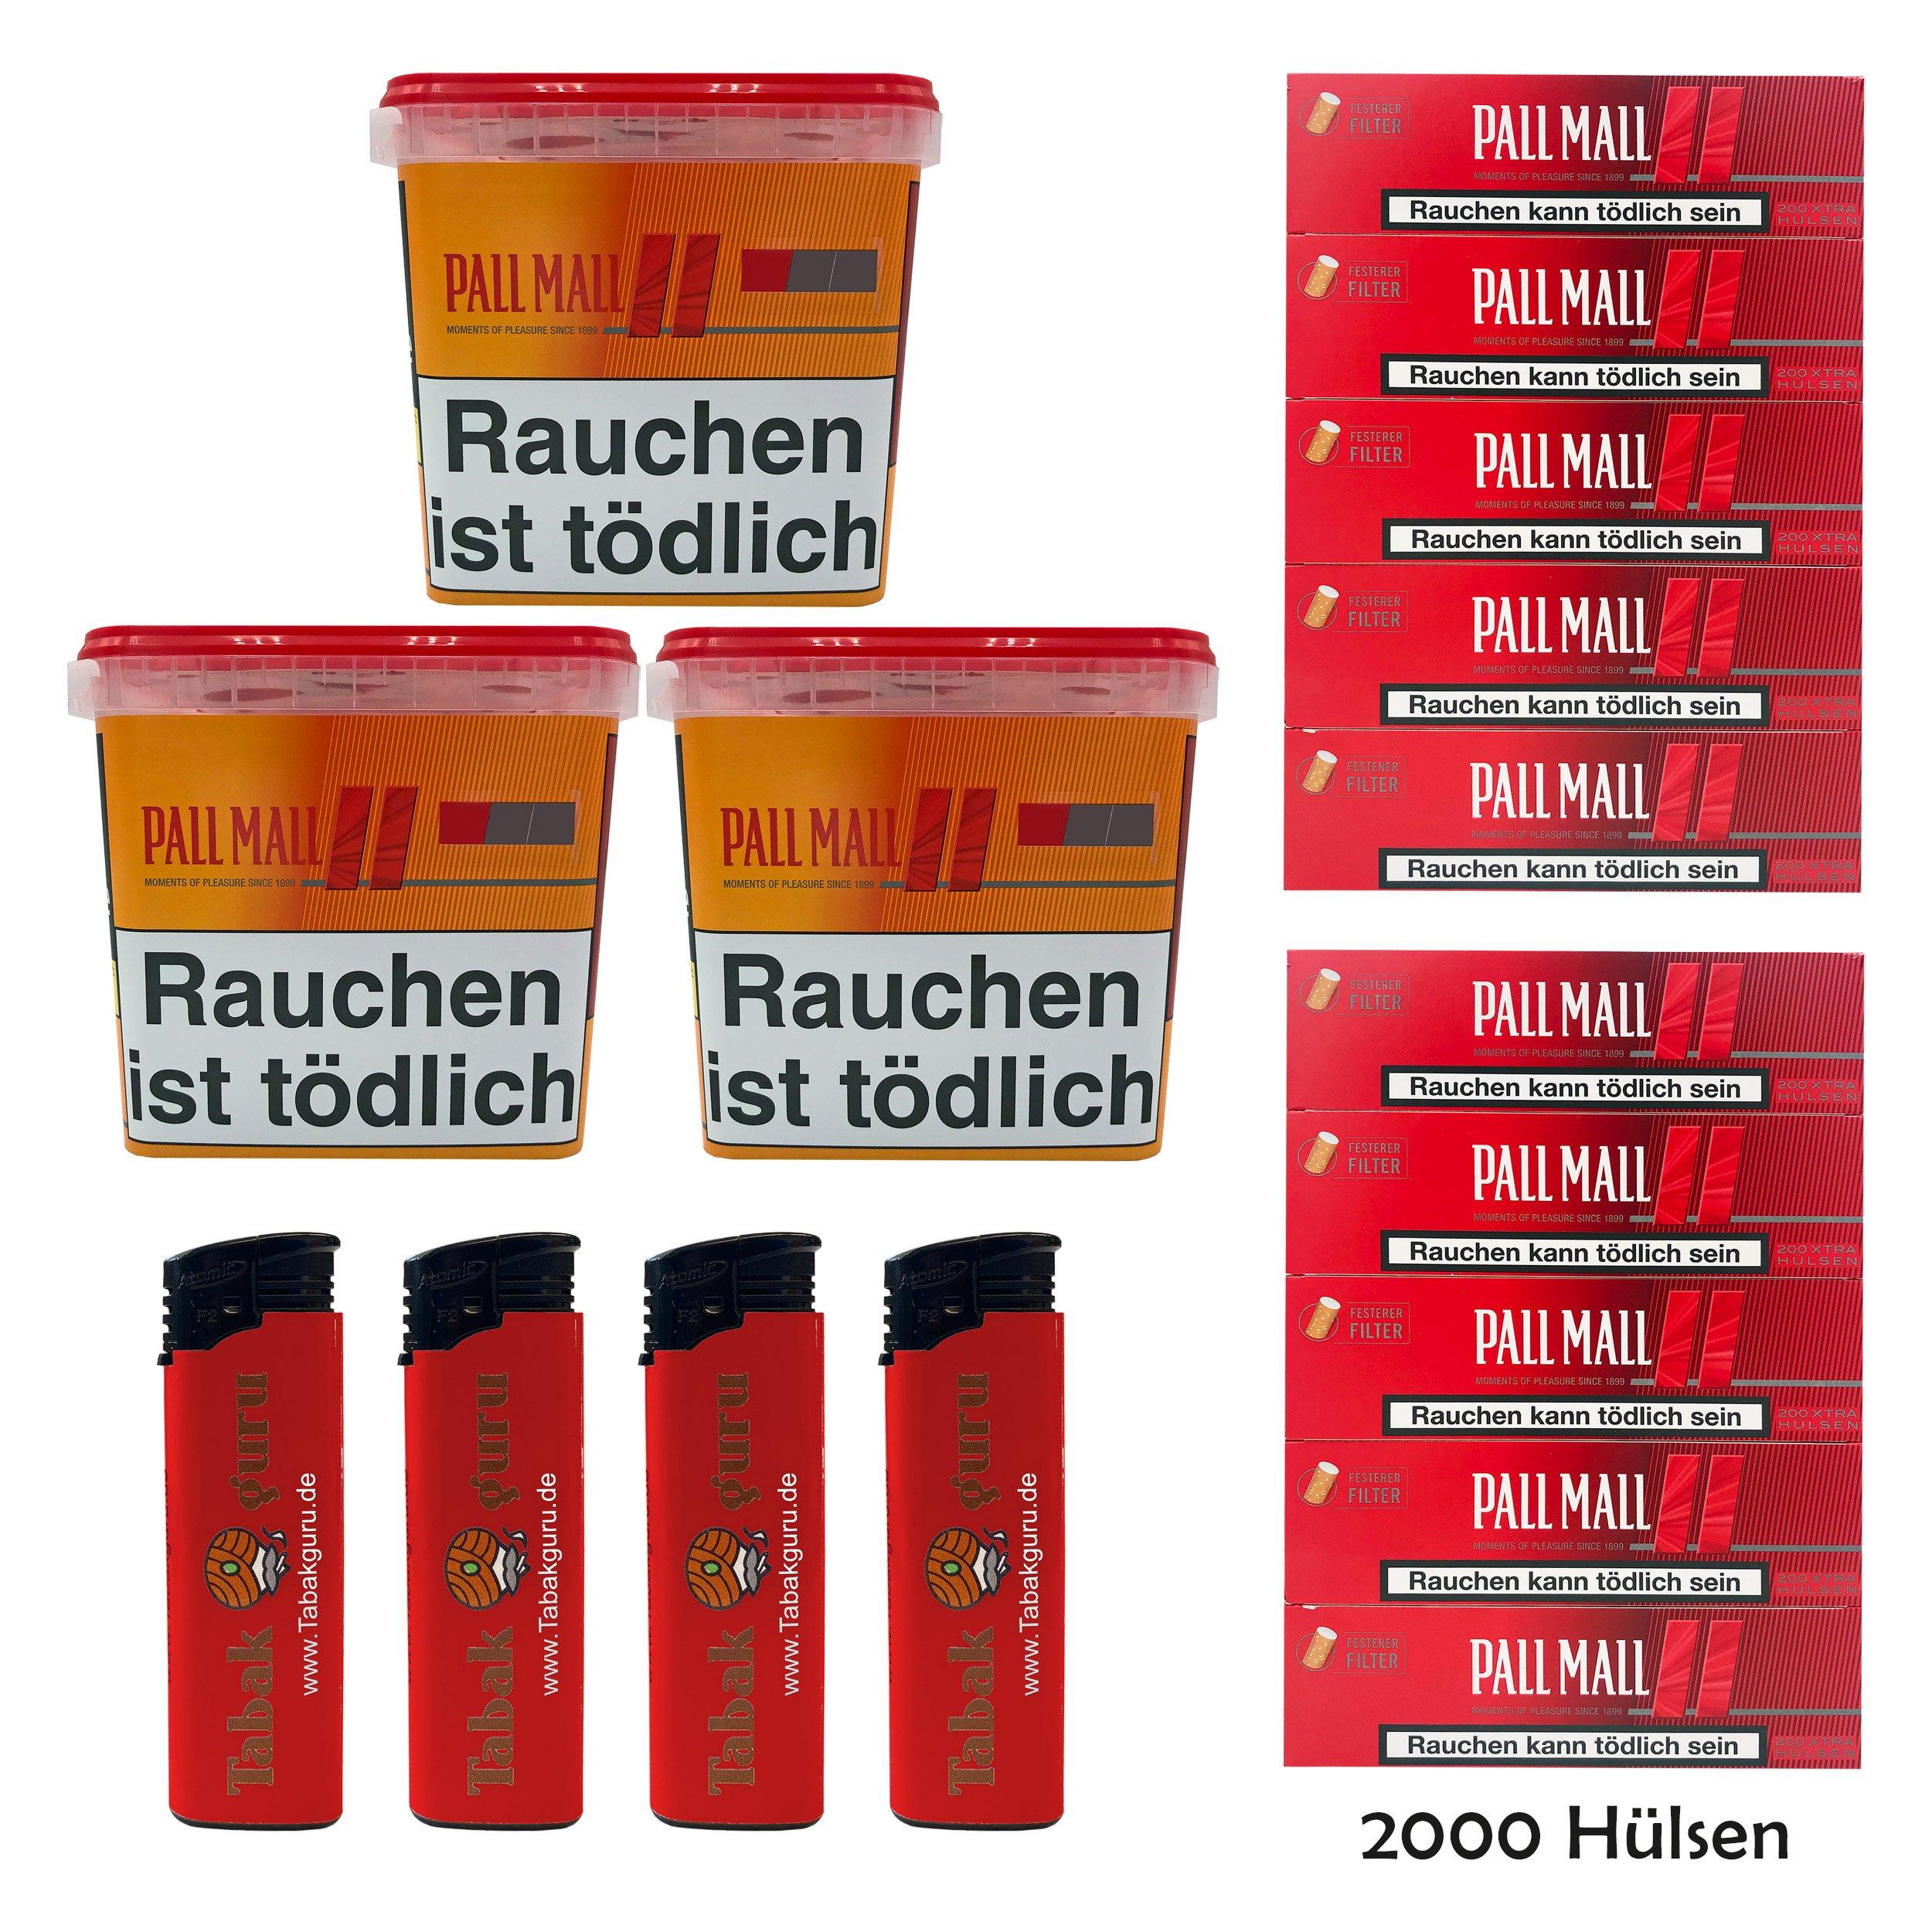 3x Pall Mall Allround Giga Box 280 g Tabak/Volumentabak, Red Xtra Hülsen, Feuerz.